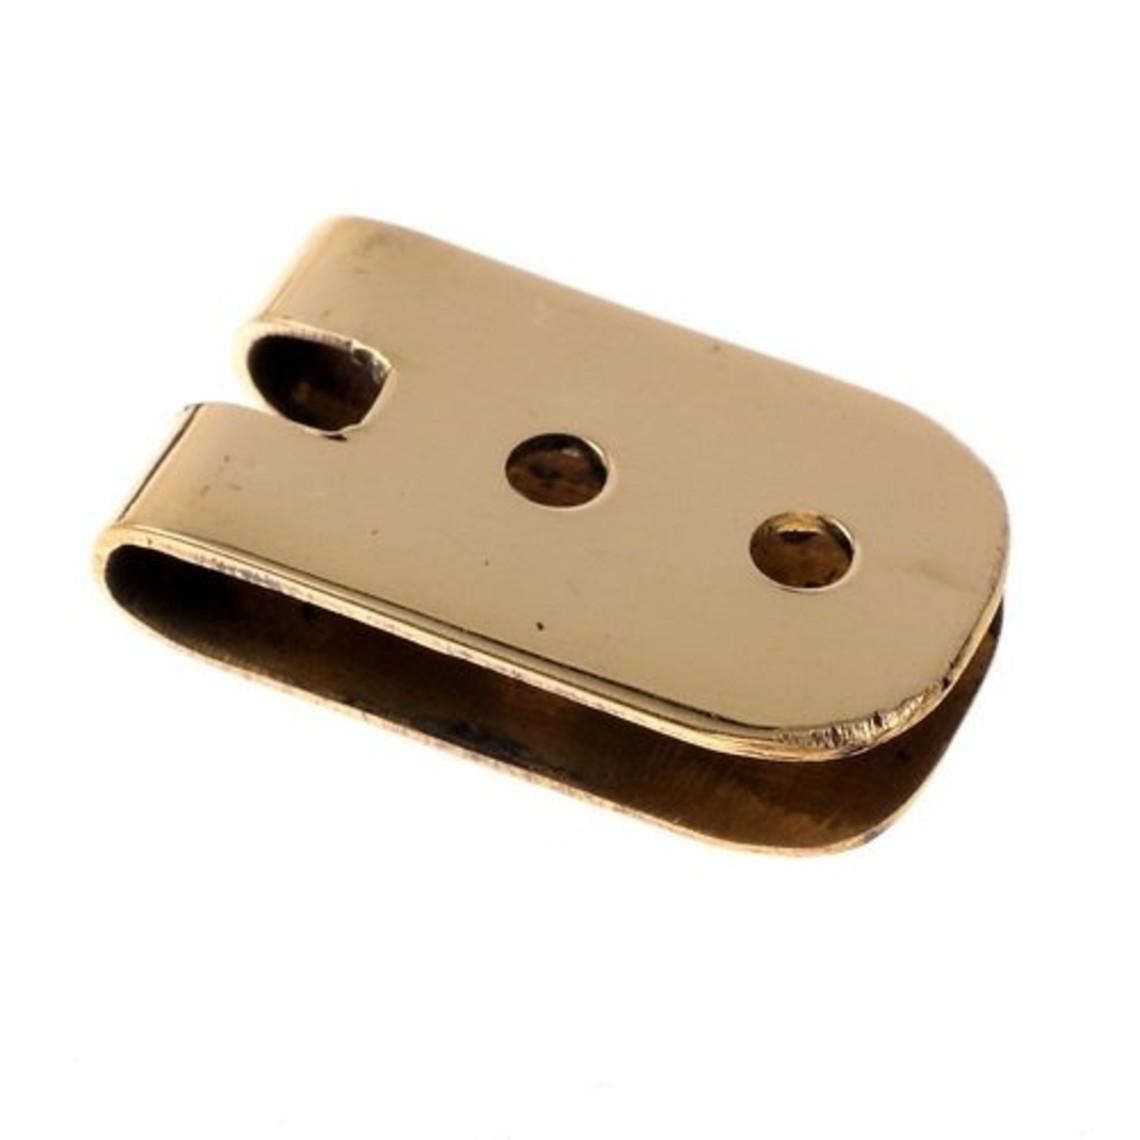 placa Belt 1,5 cm, bronce